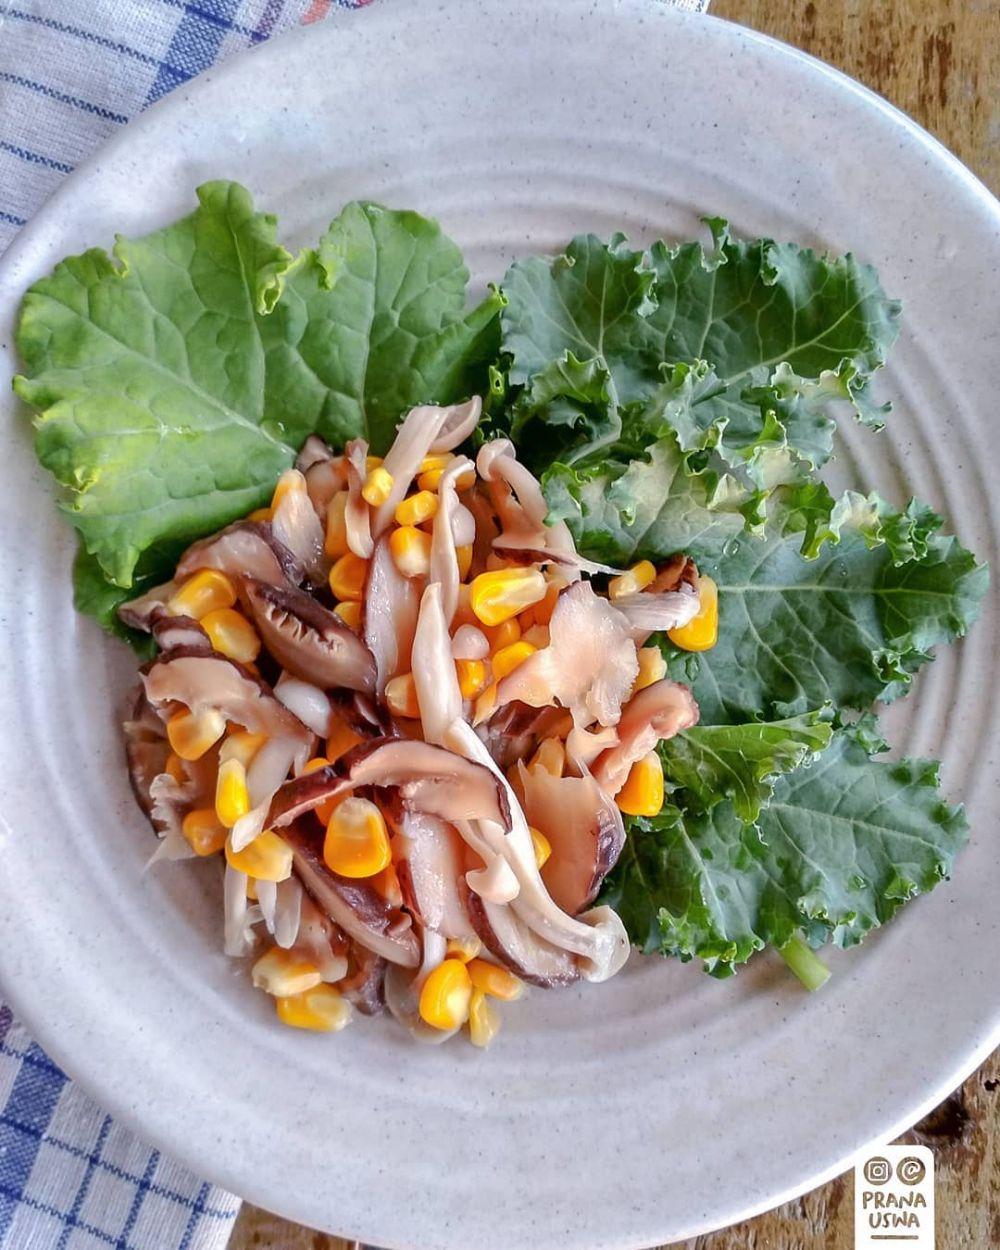 Resep olahan sayur kale © 2020 brilio.net